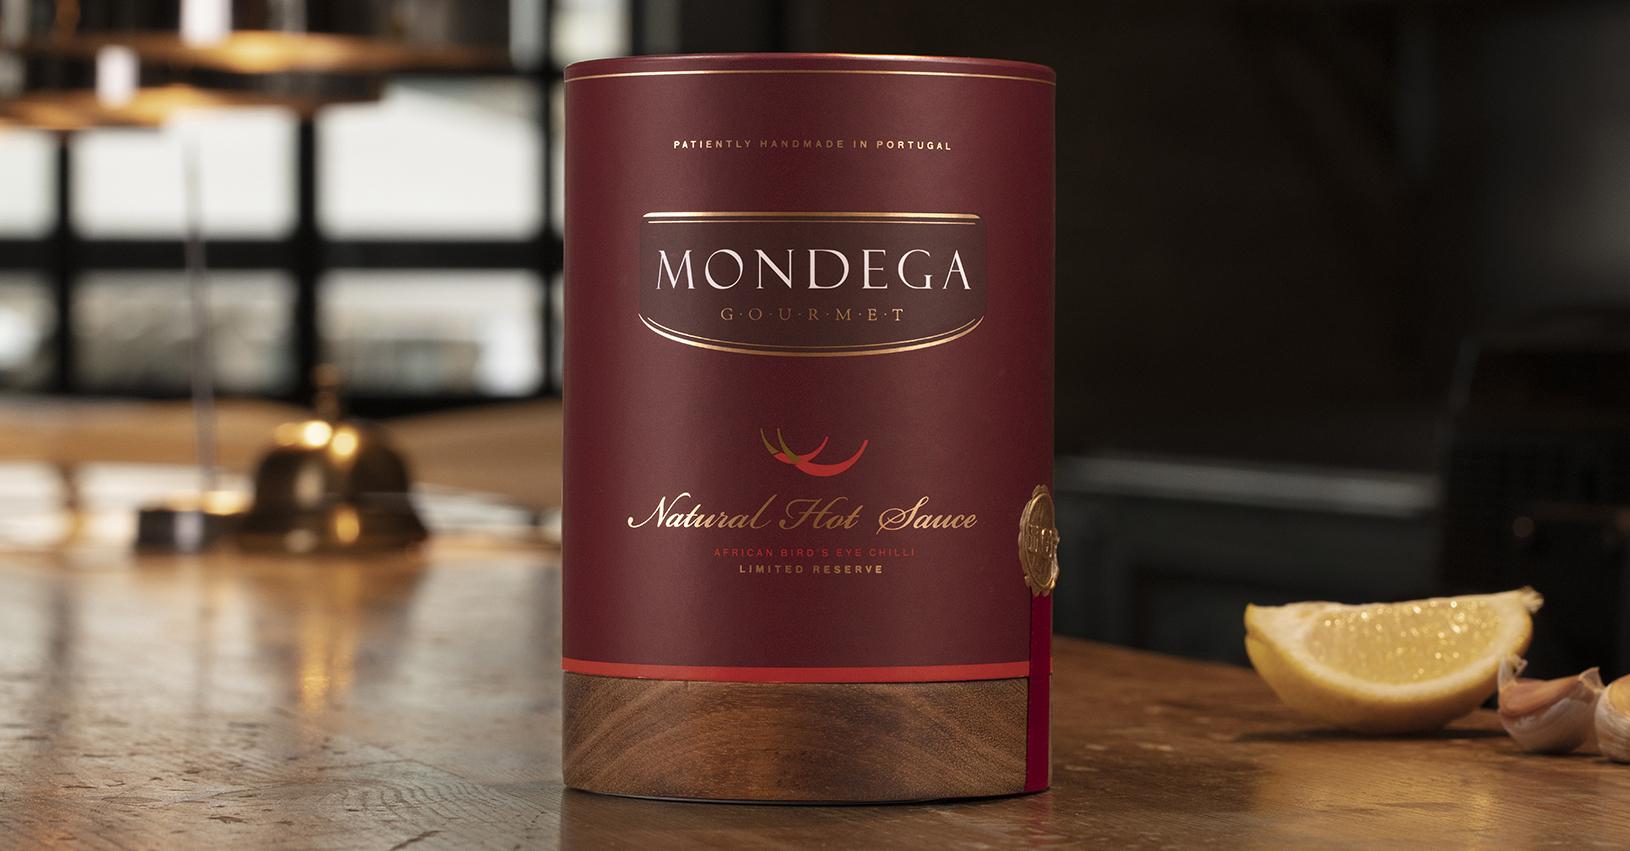 Mondega Sauce